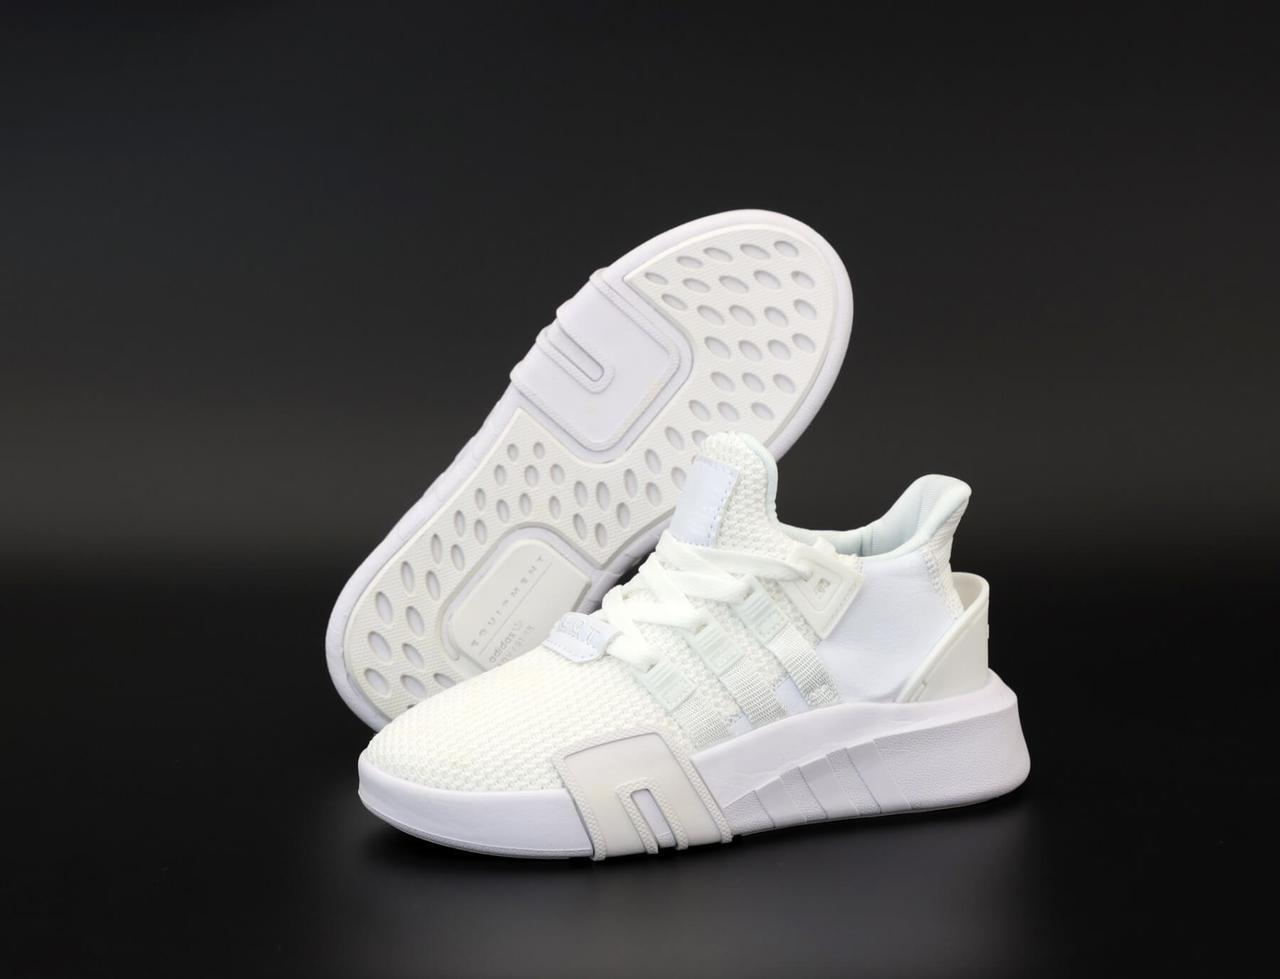 Женские кроссовки Adidas EQT ADV Gazelle Triple White (Адидас ЕКТ белого цвета весна/лето)